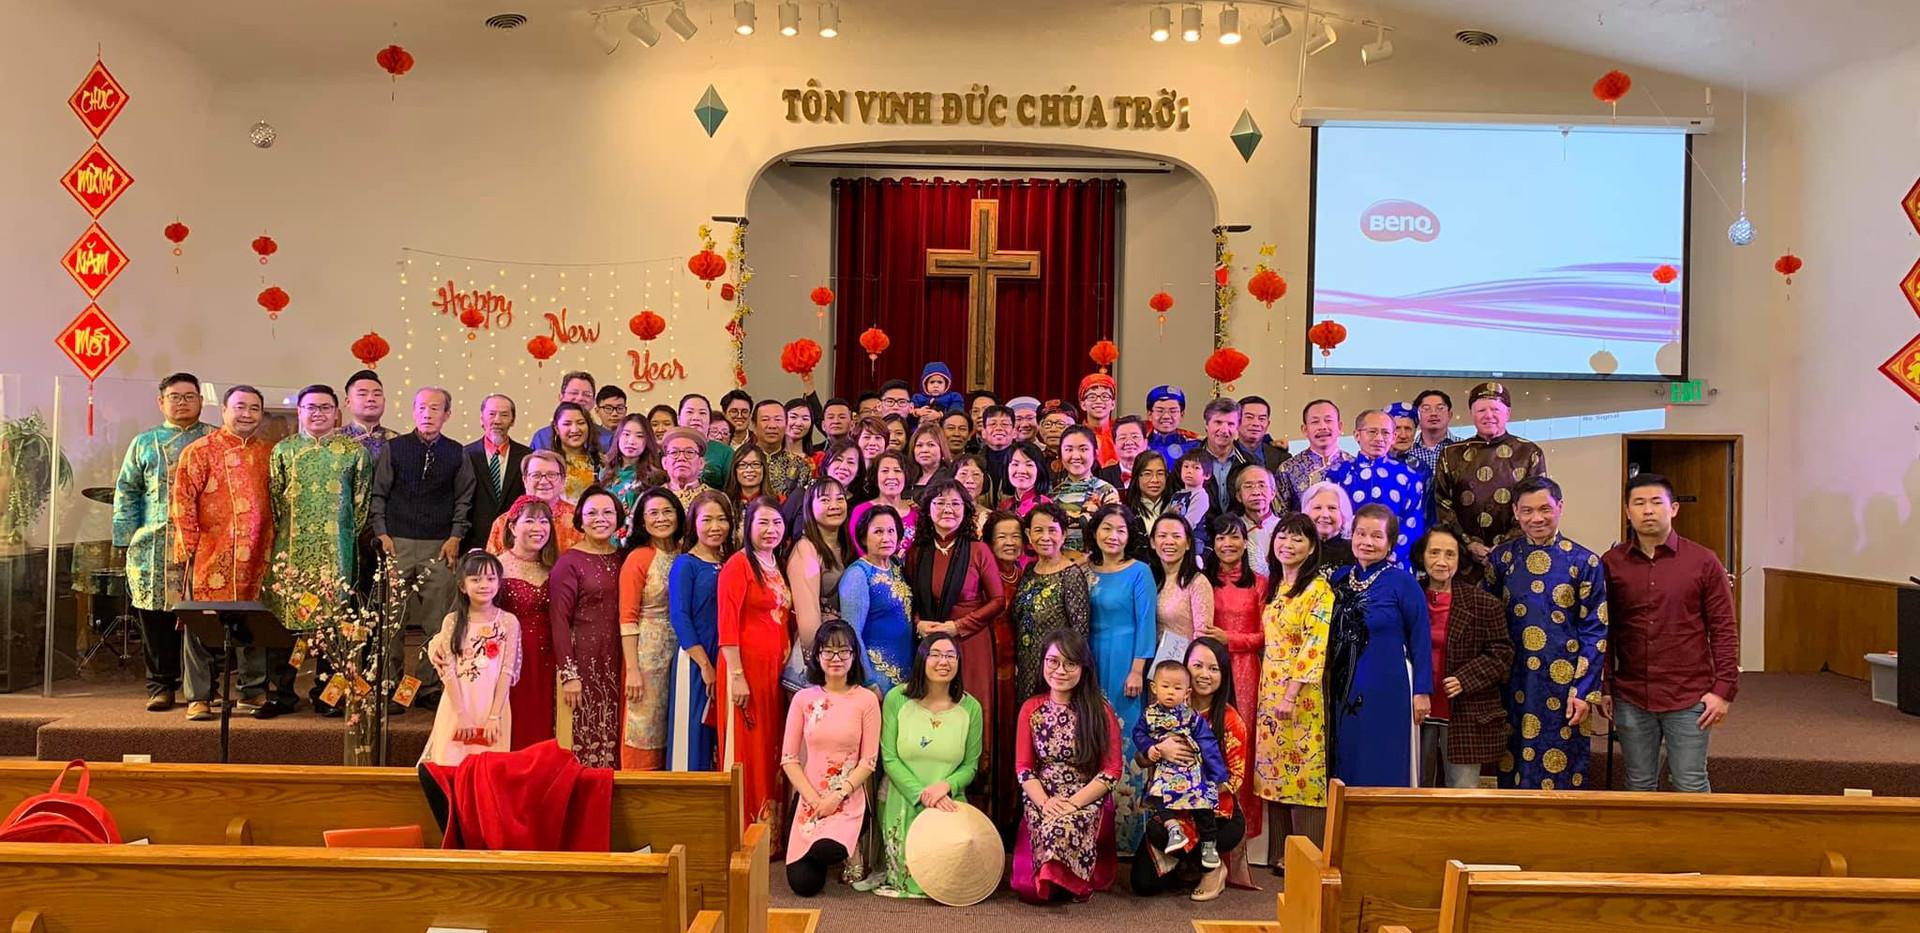 New Year (Tết) 2020